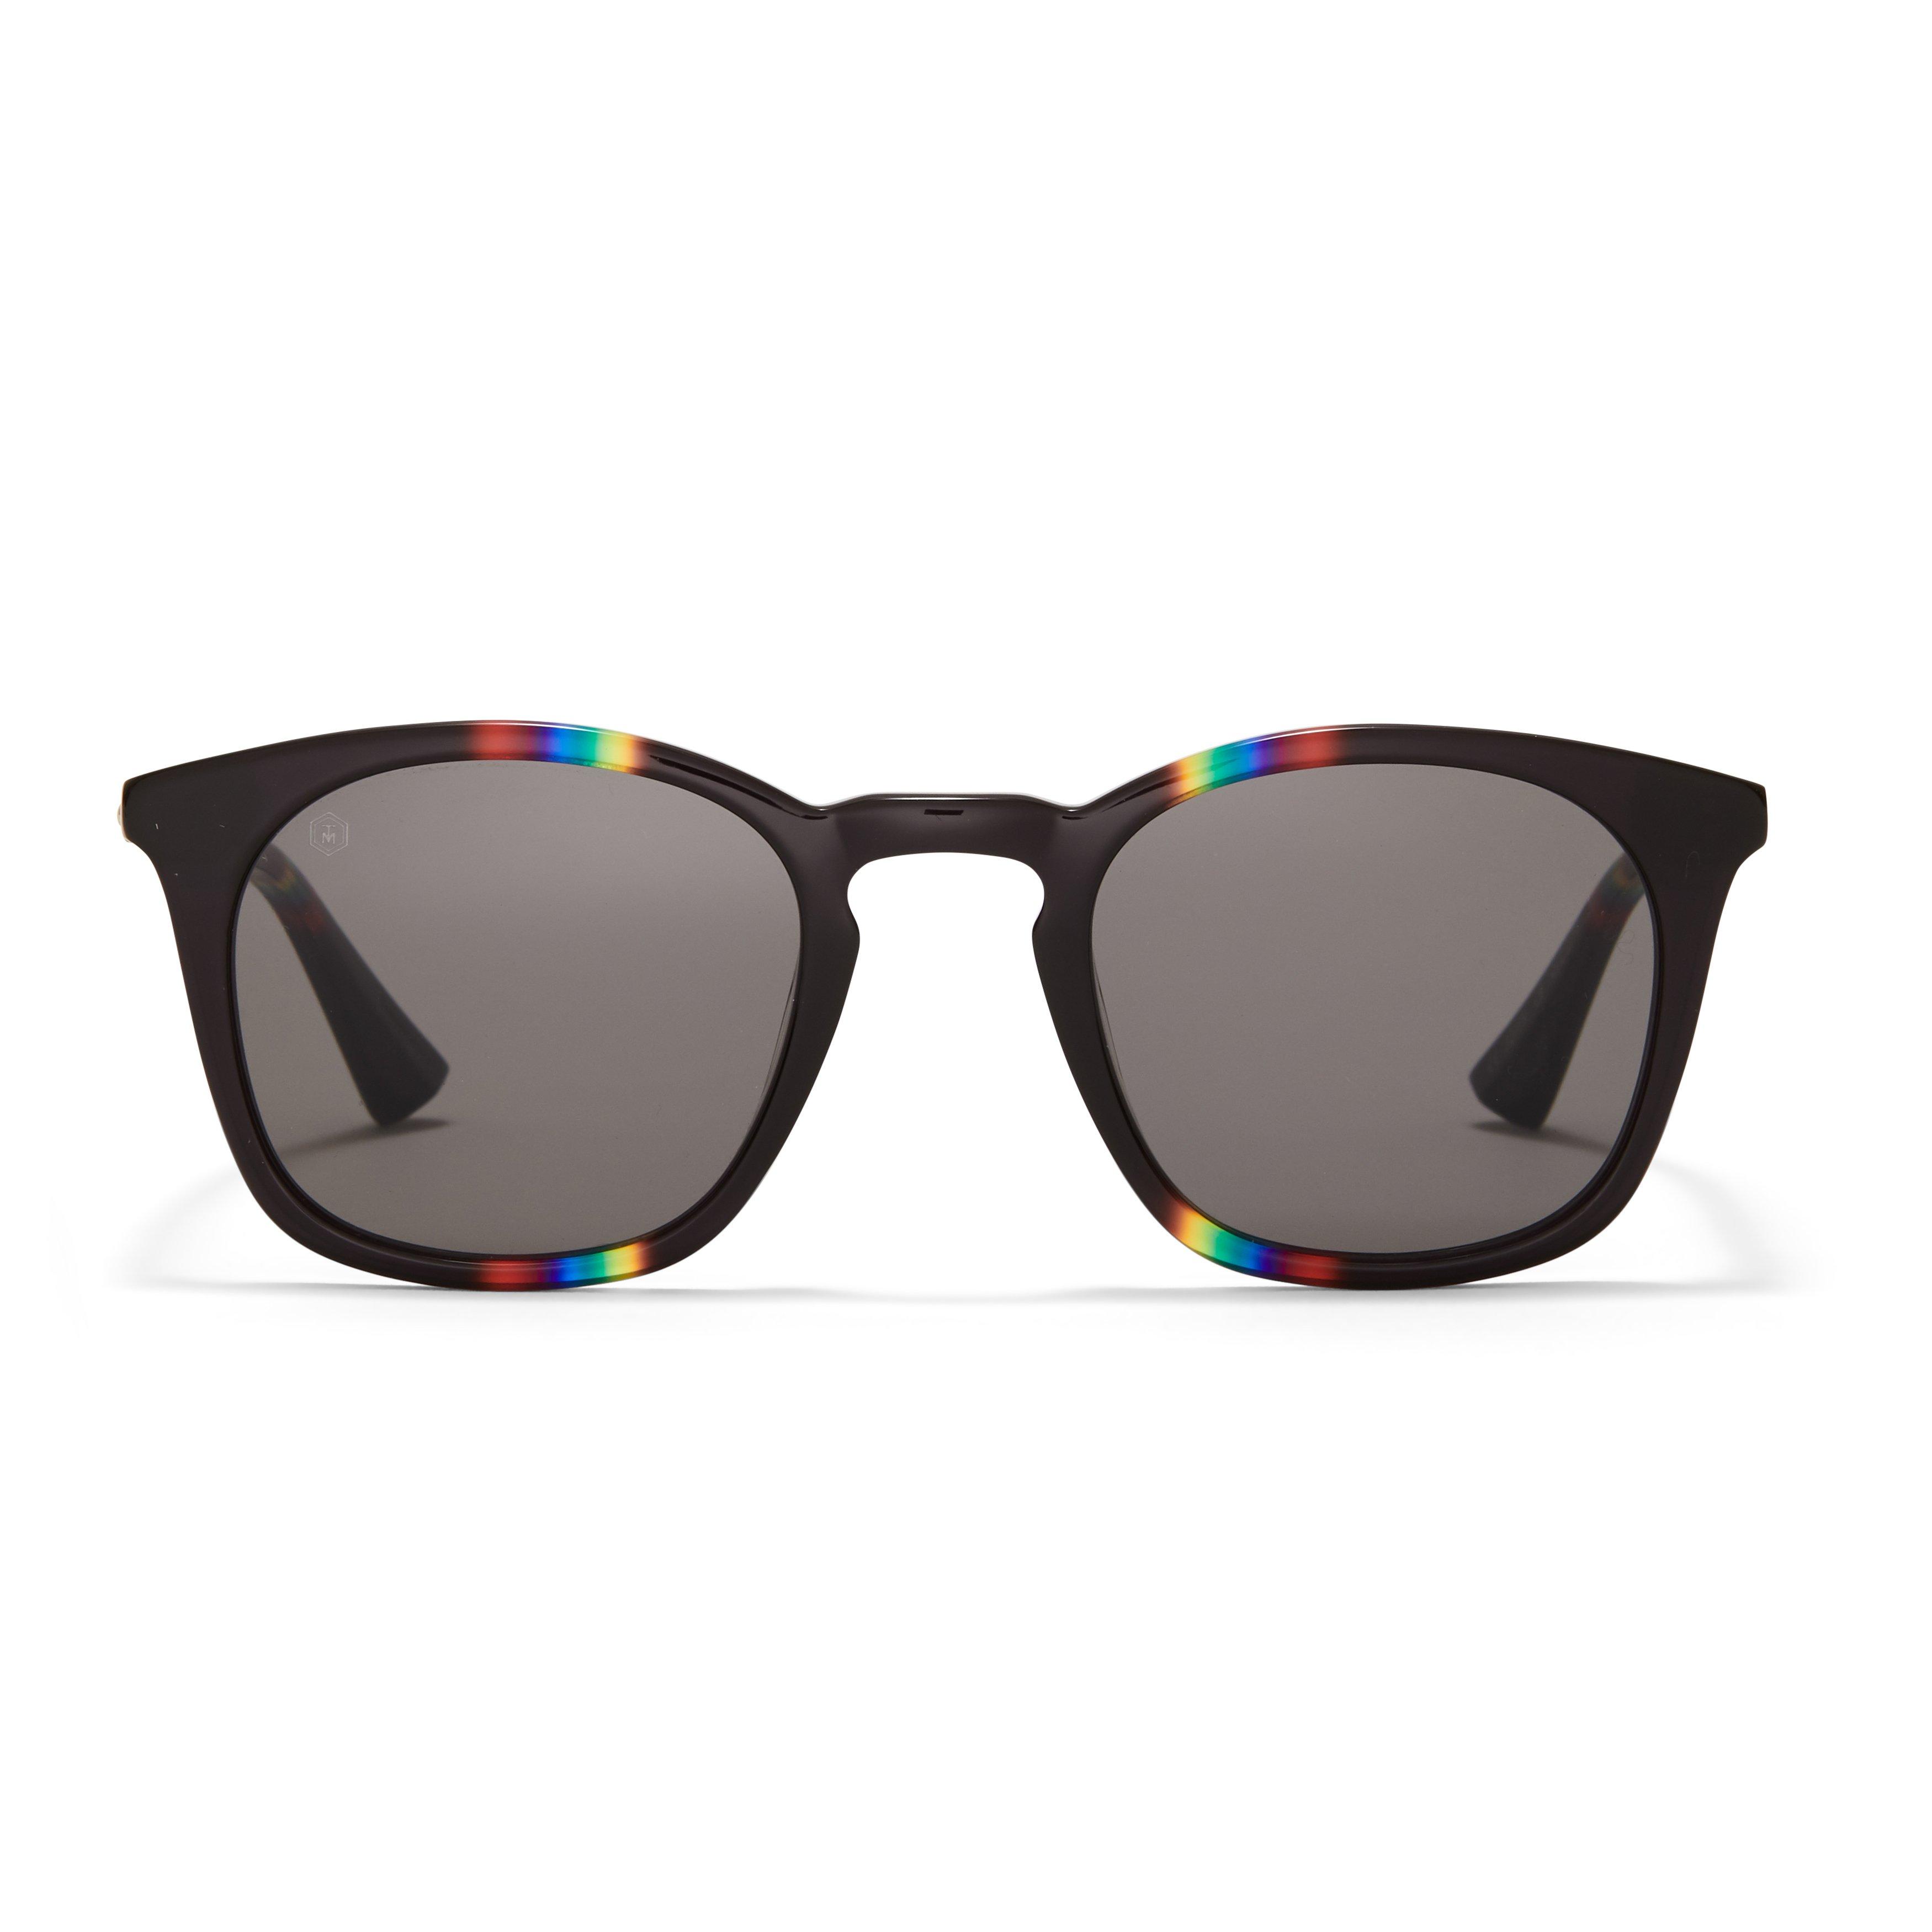 Taylor Morris Louis Orson Sunglasses, Non-prescription